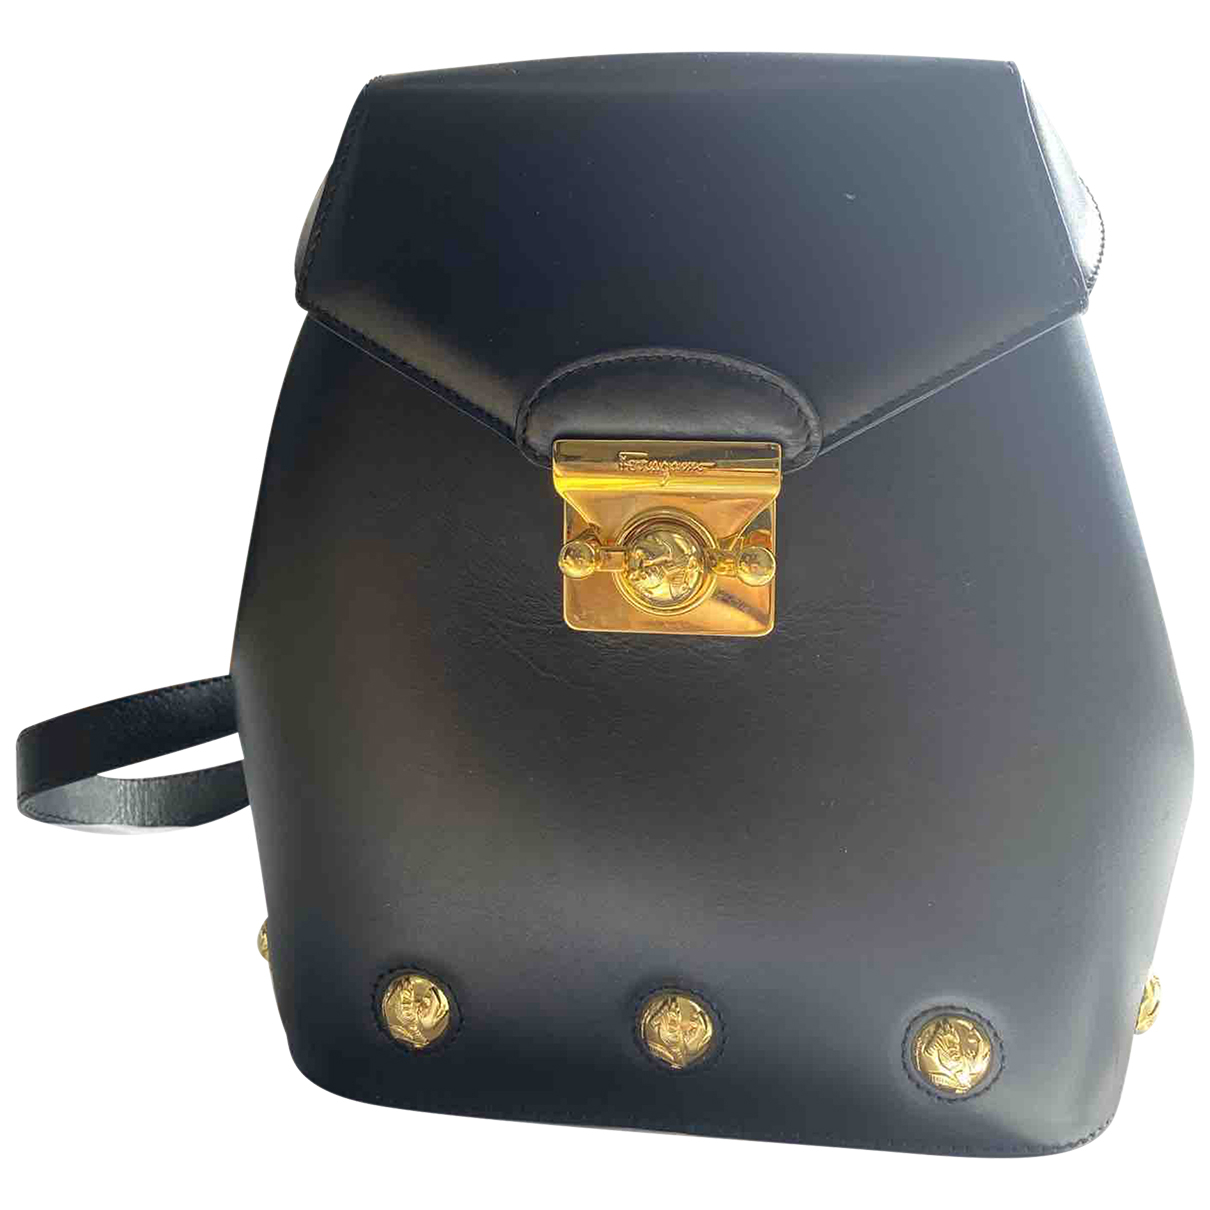 Salvatore Ferragamo N Black Leather backpack for Women N